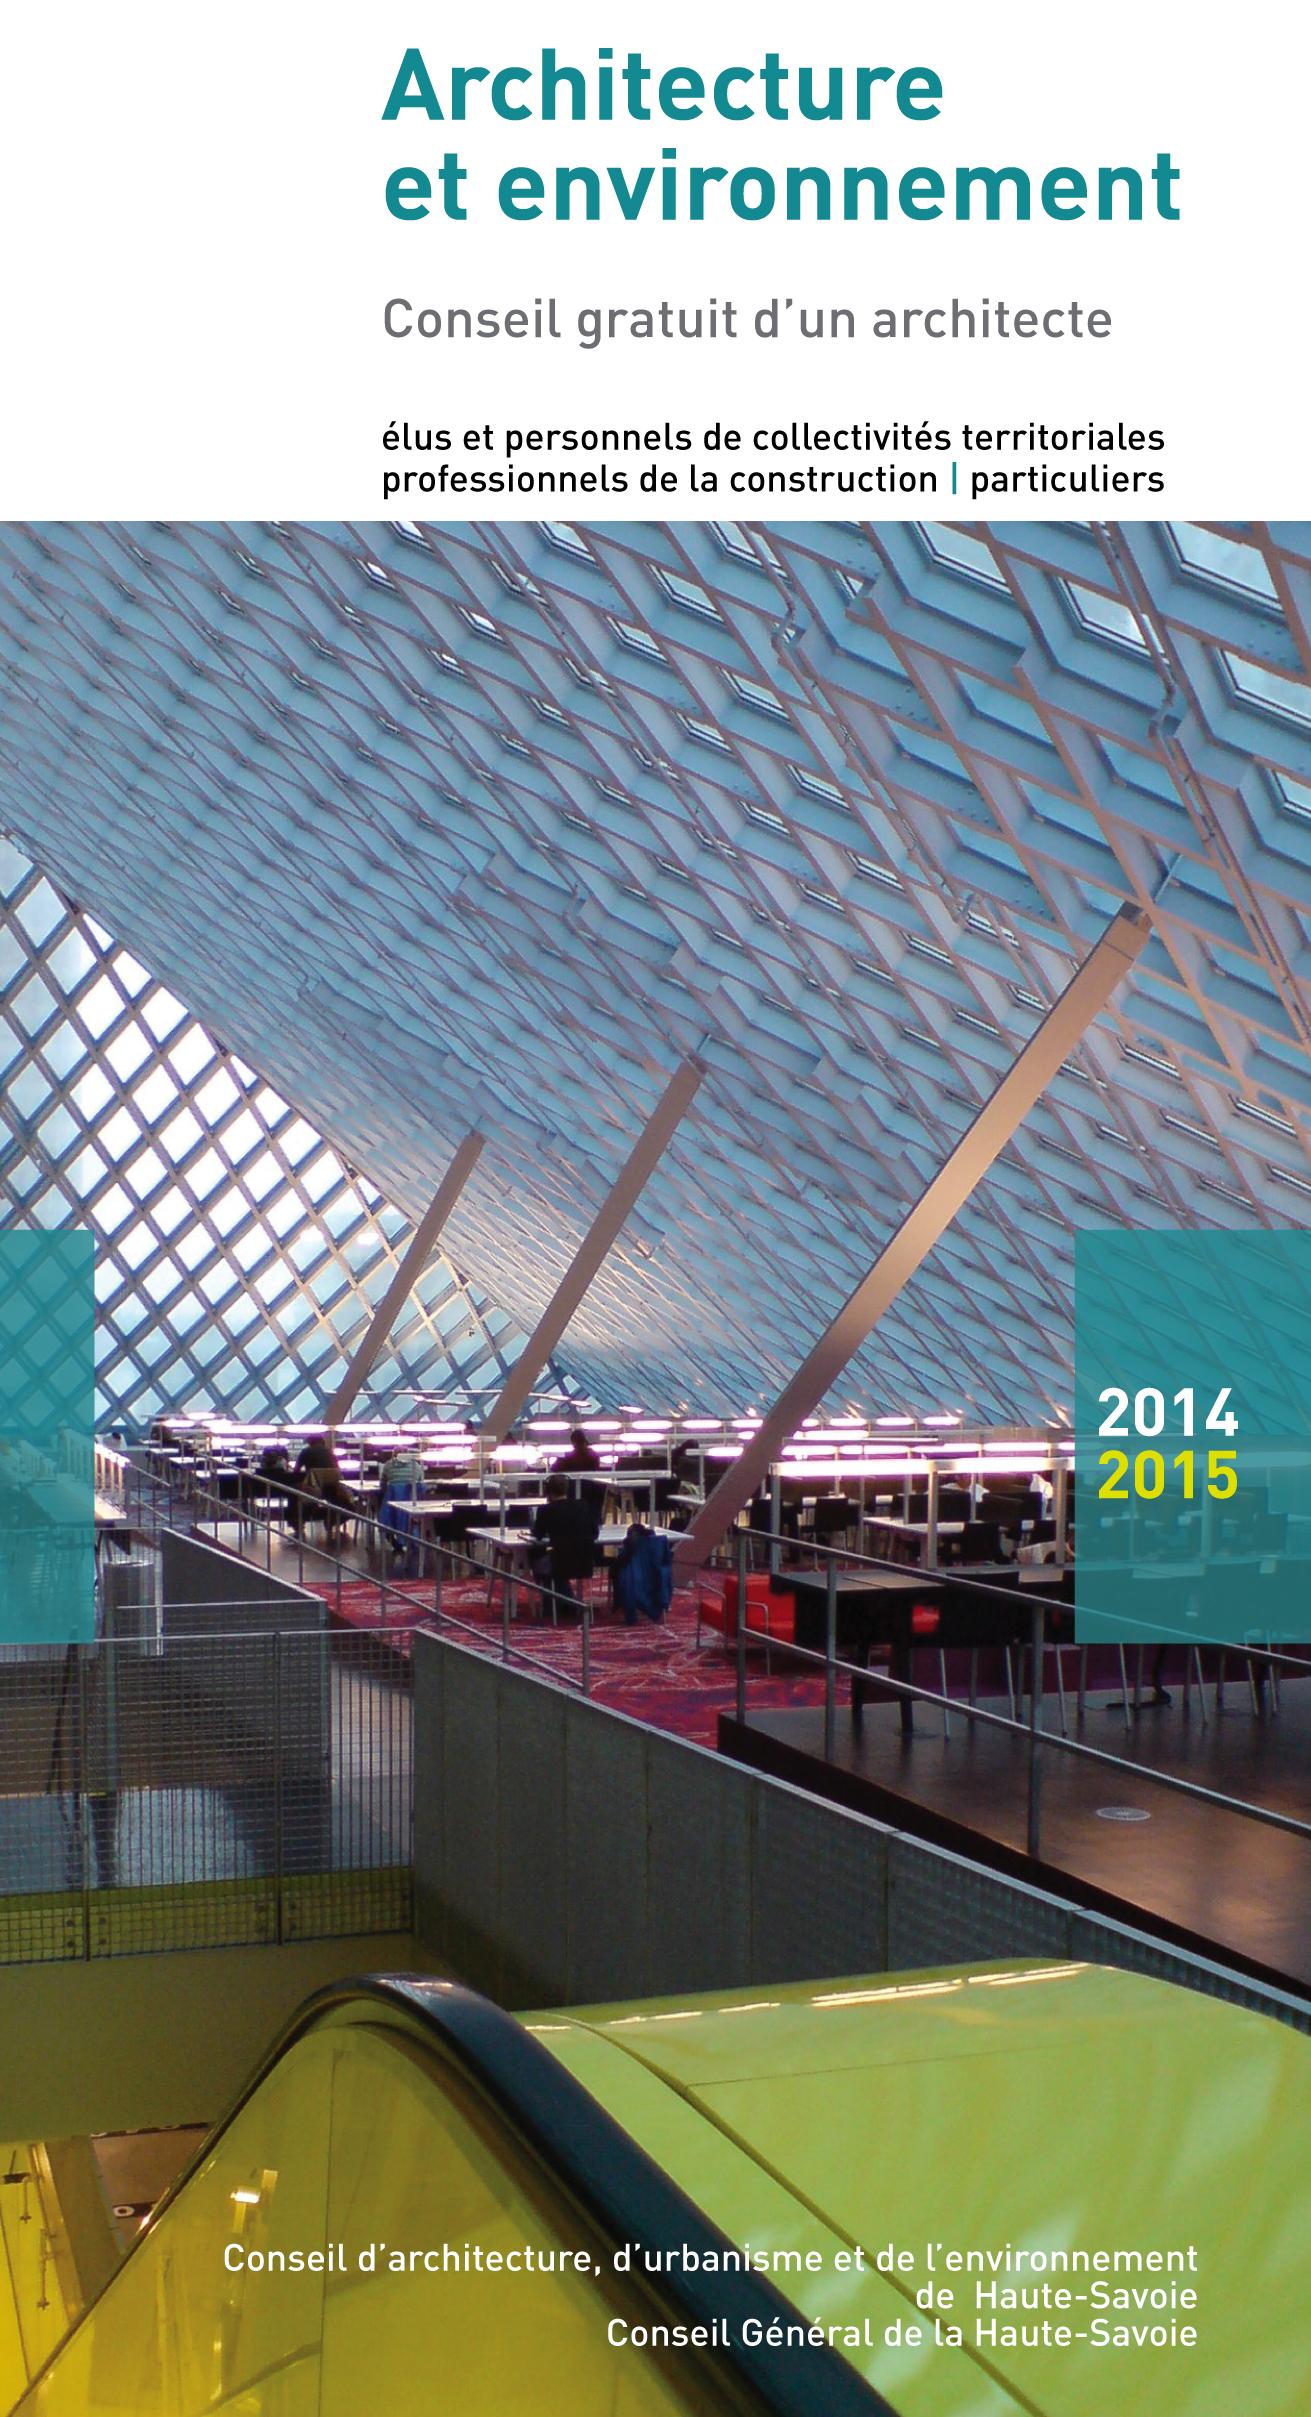 Flyer architecture environnement 2014-2015